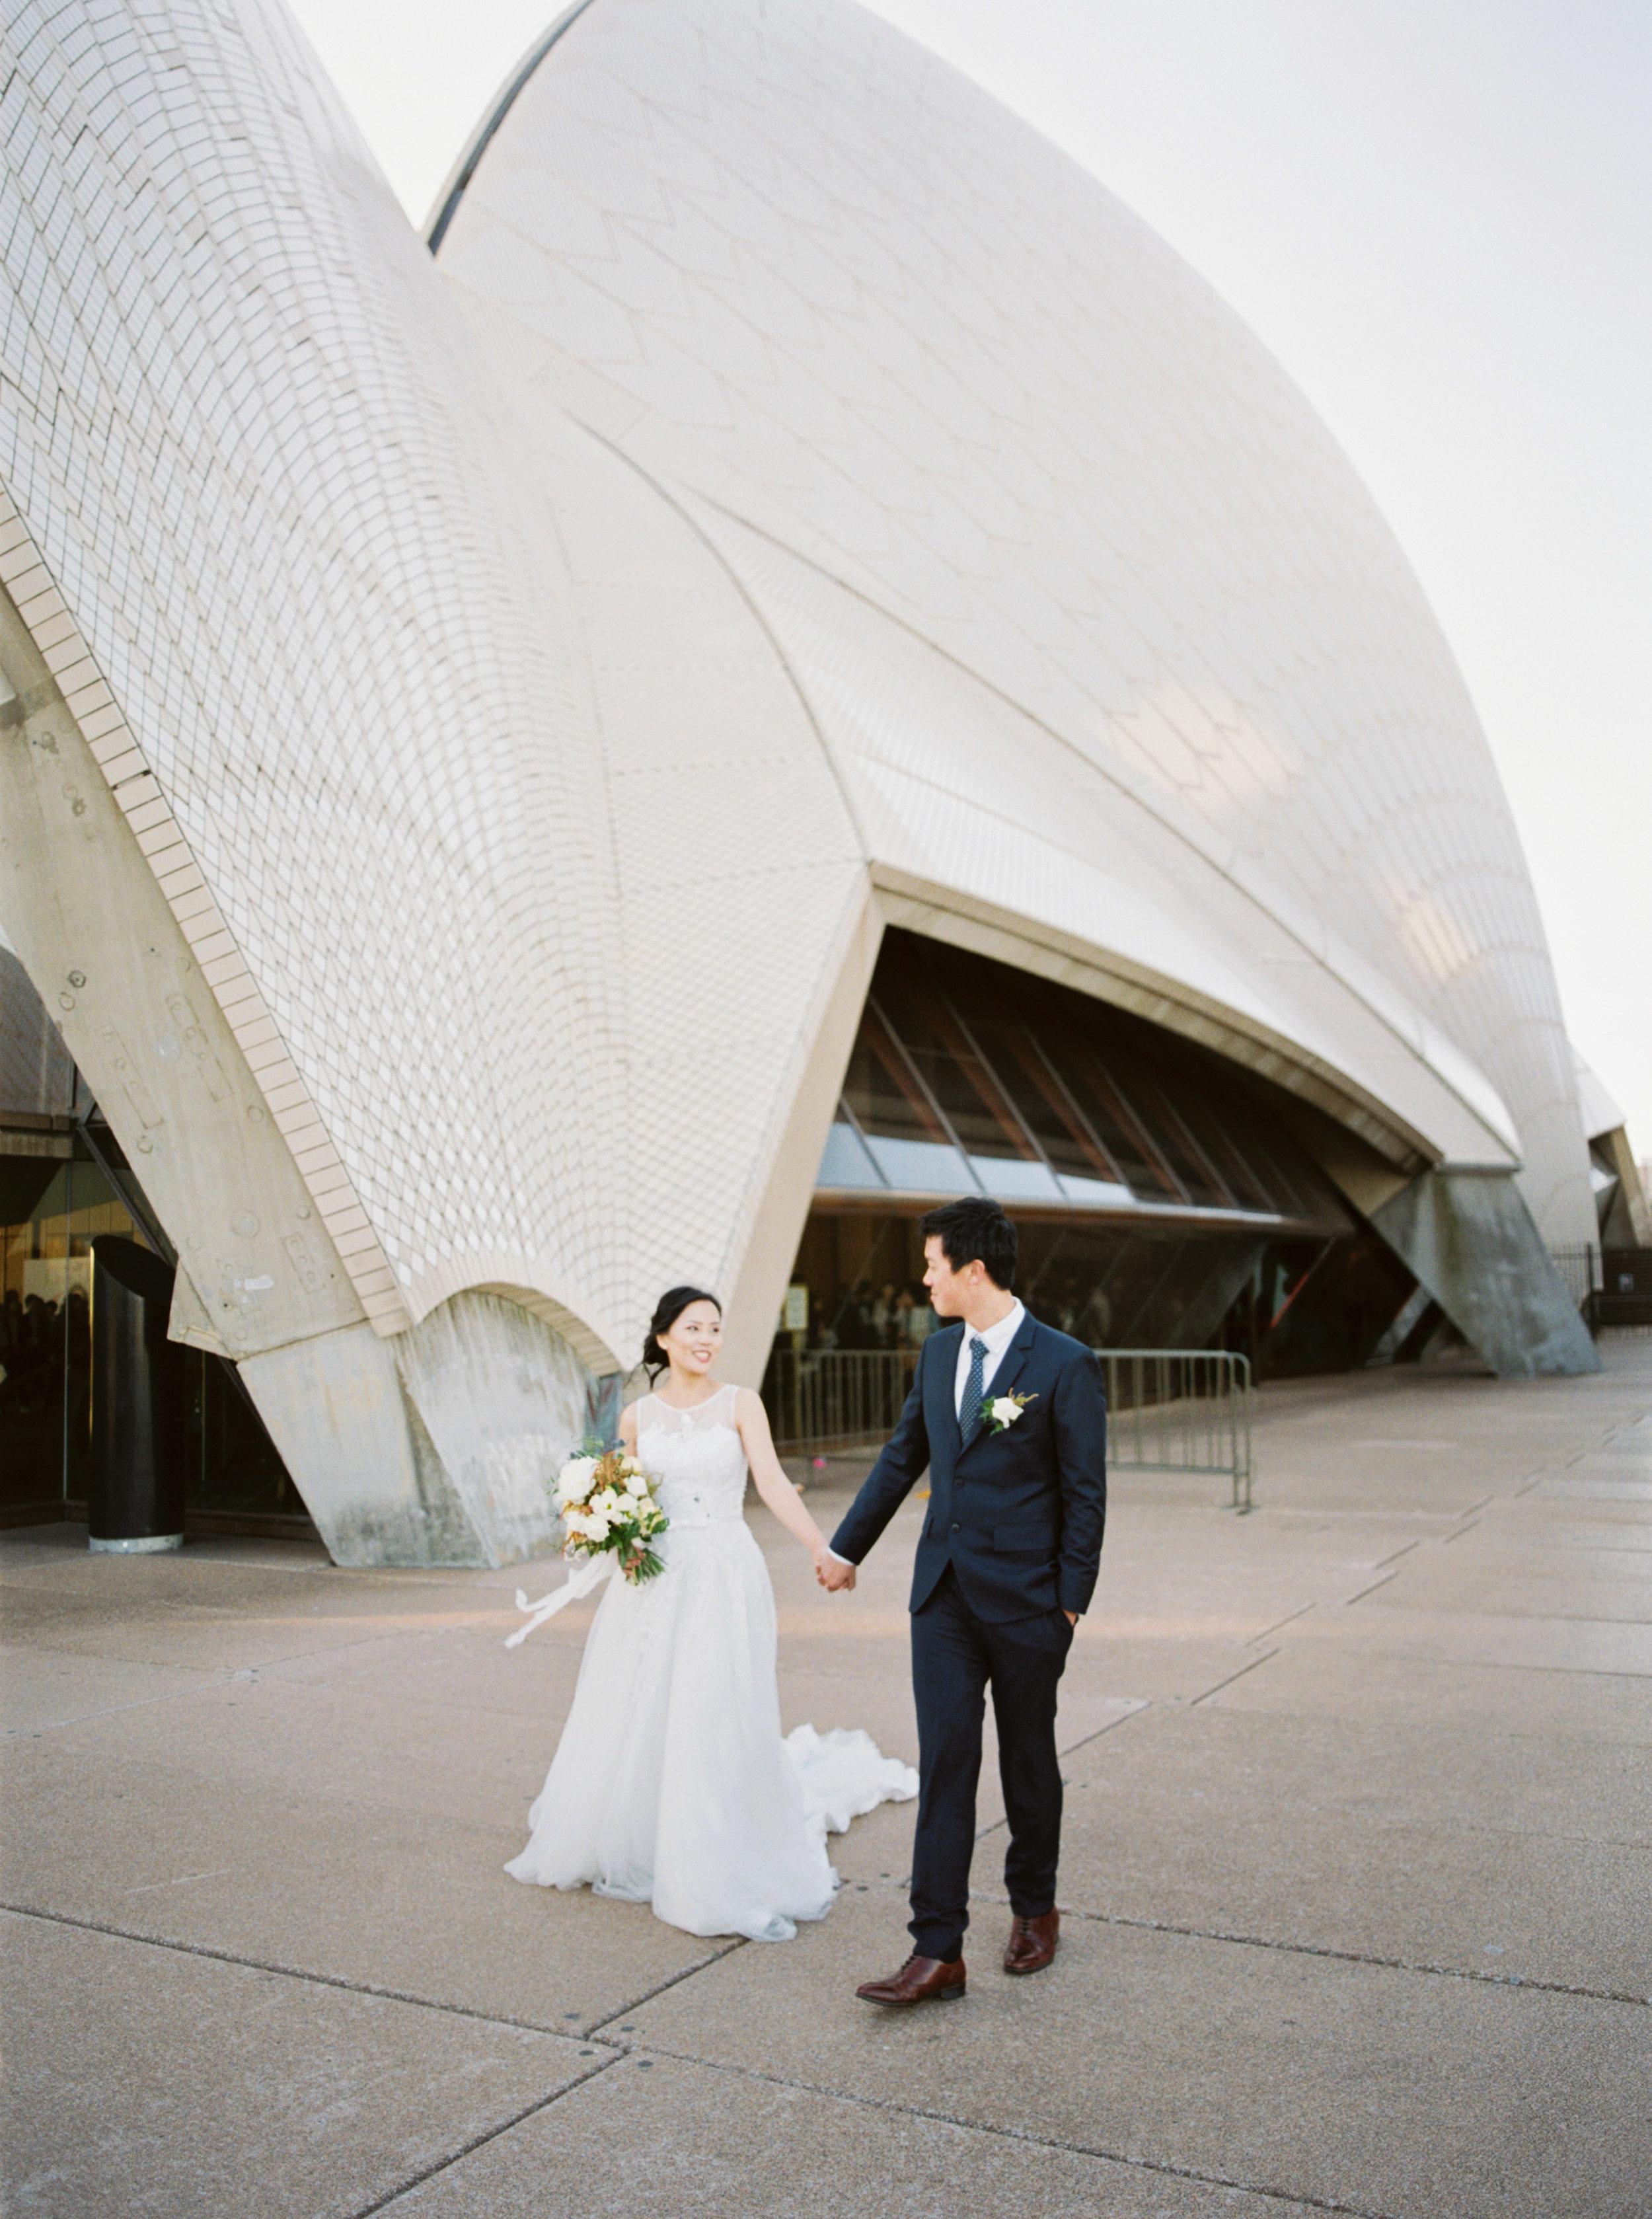 00048- Australia Sydney Wedding Photographer Sheri McMahon.jpg